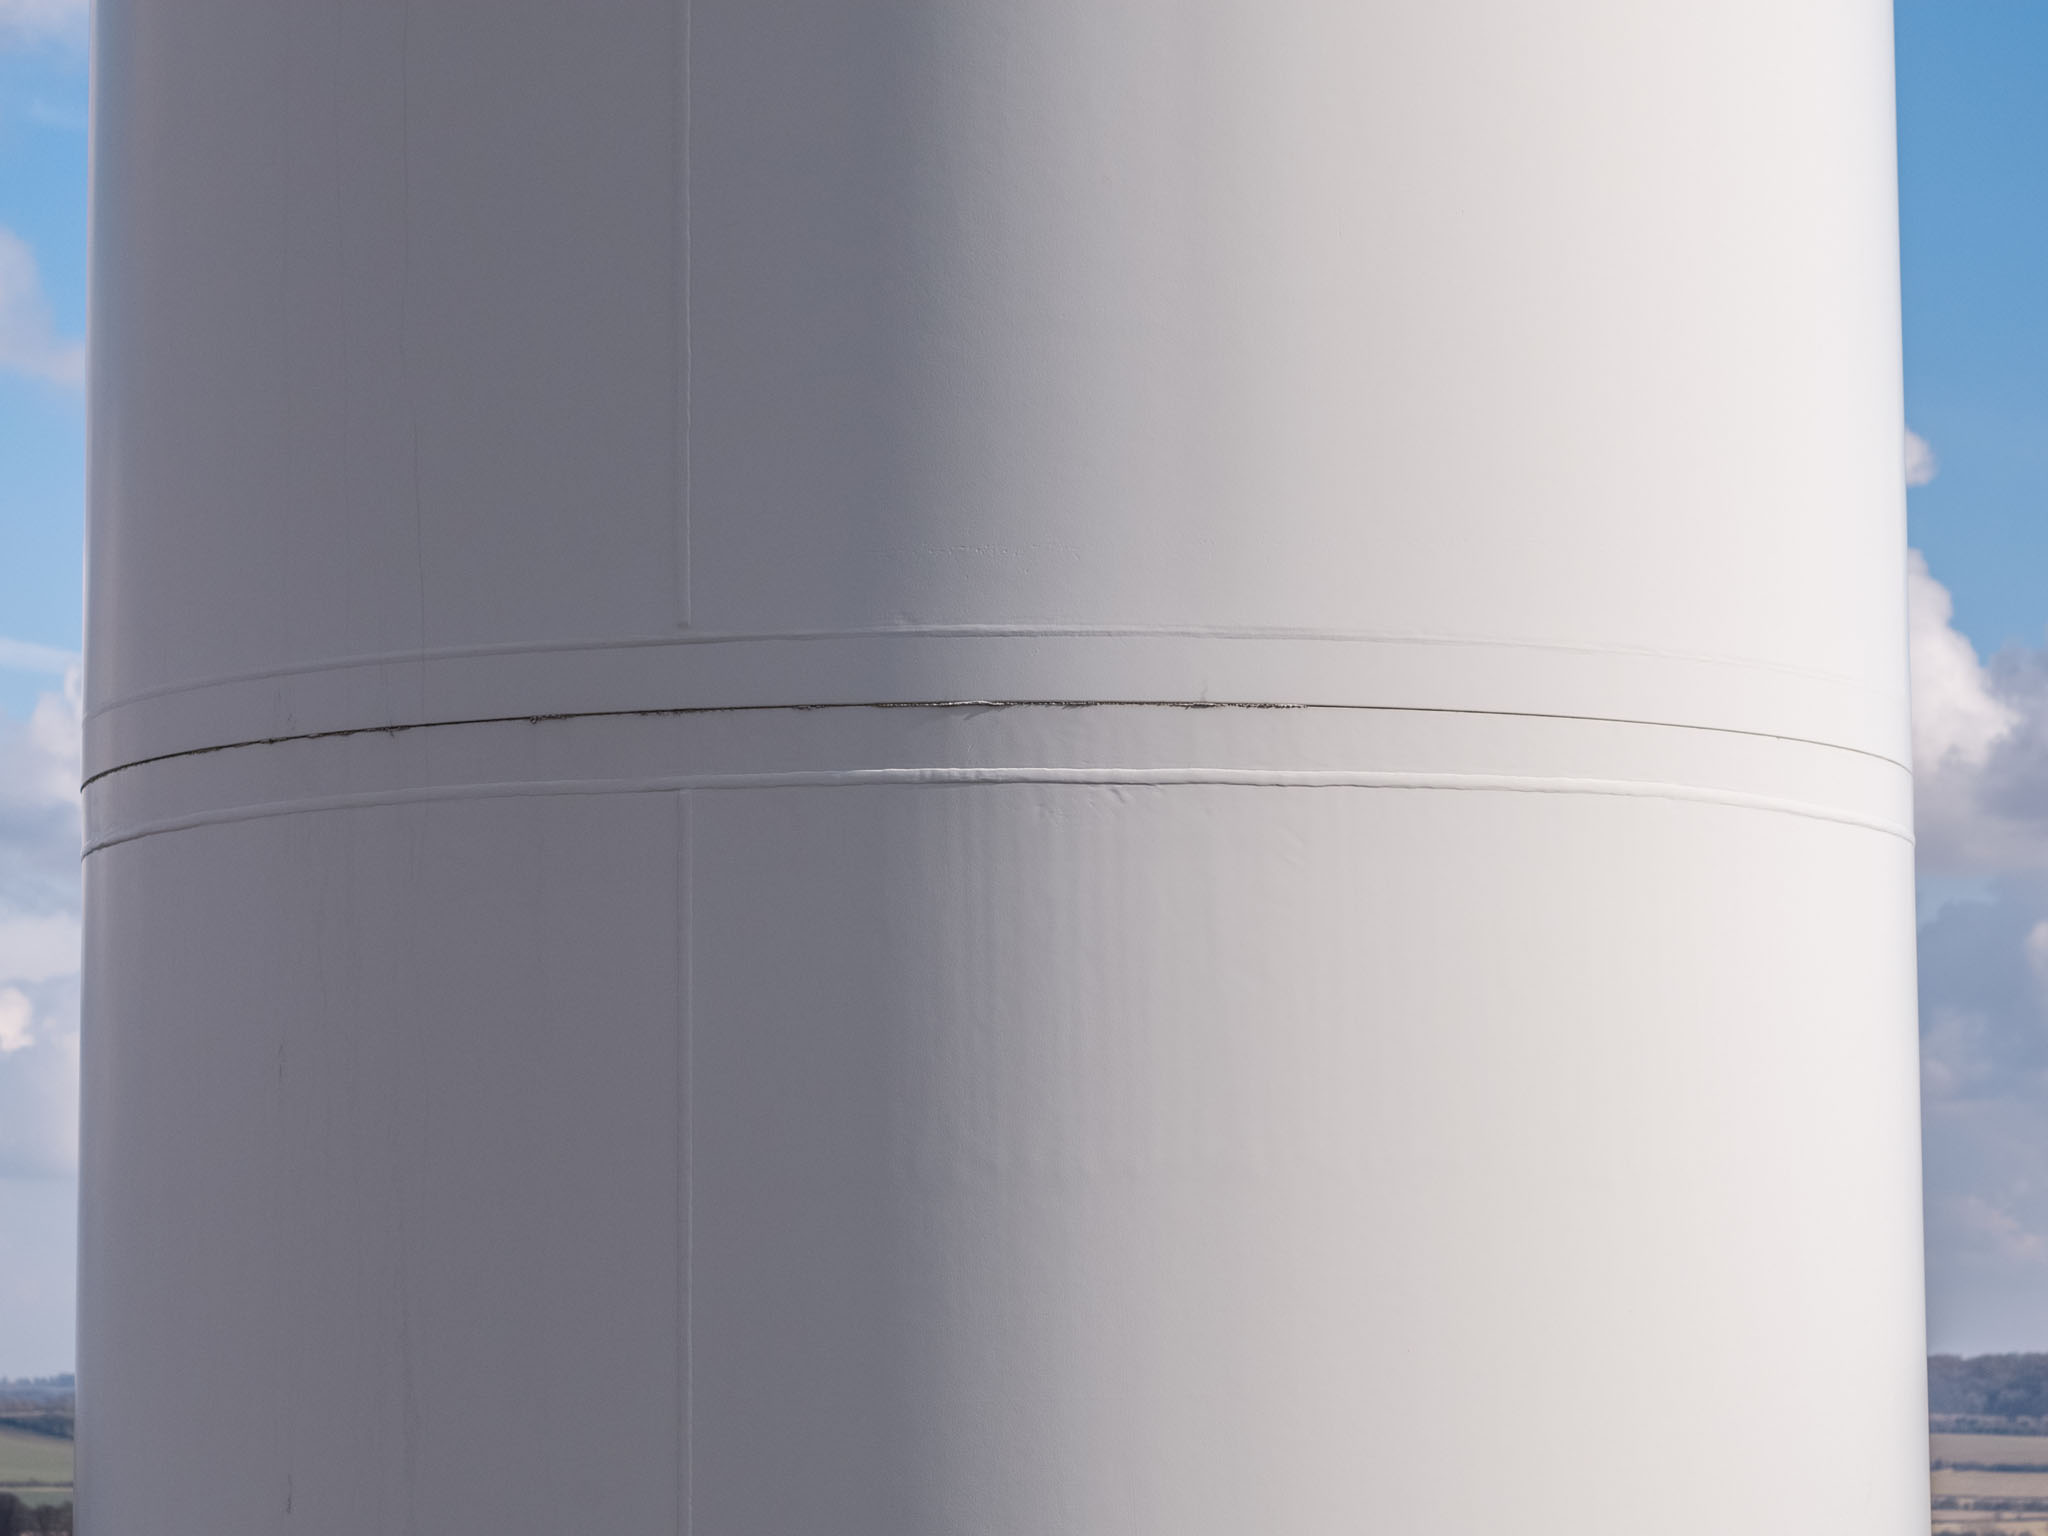 Wind turbine inspection using drones